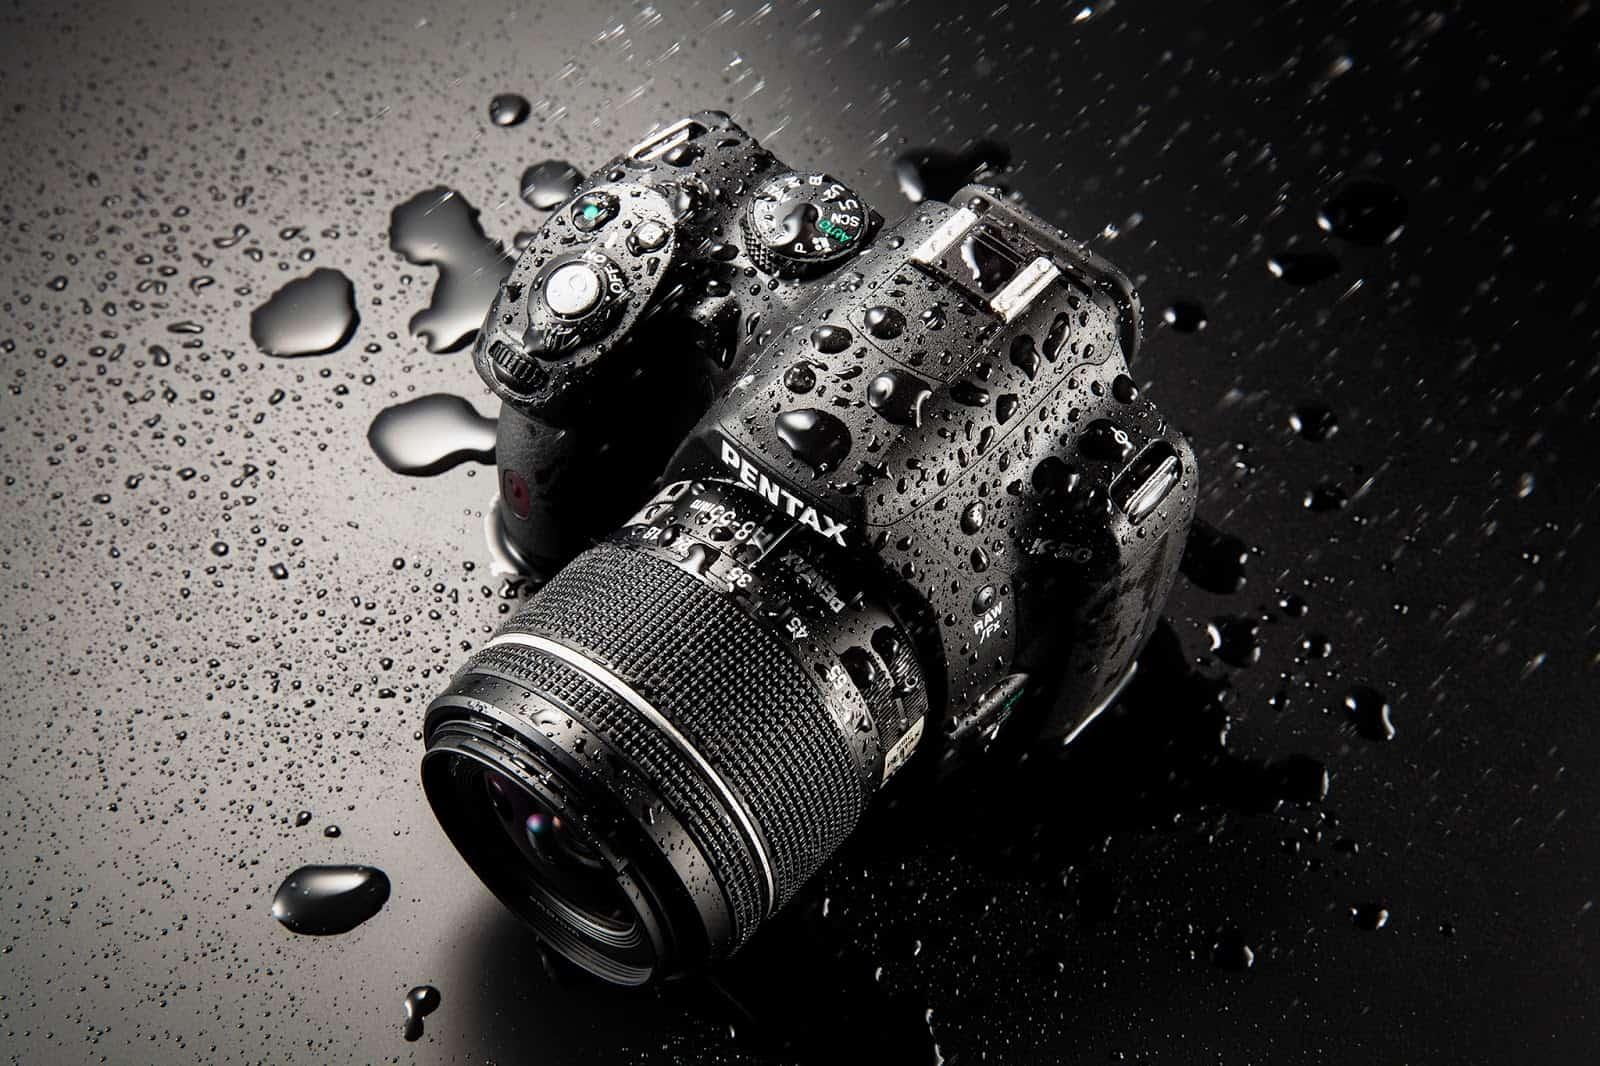 Pentax K-50 amateur camera